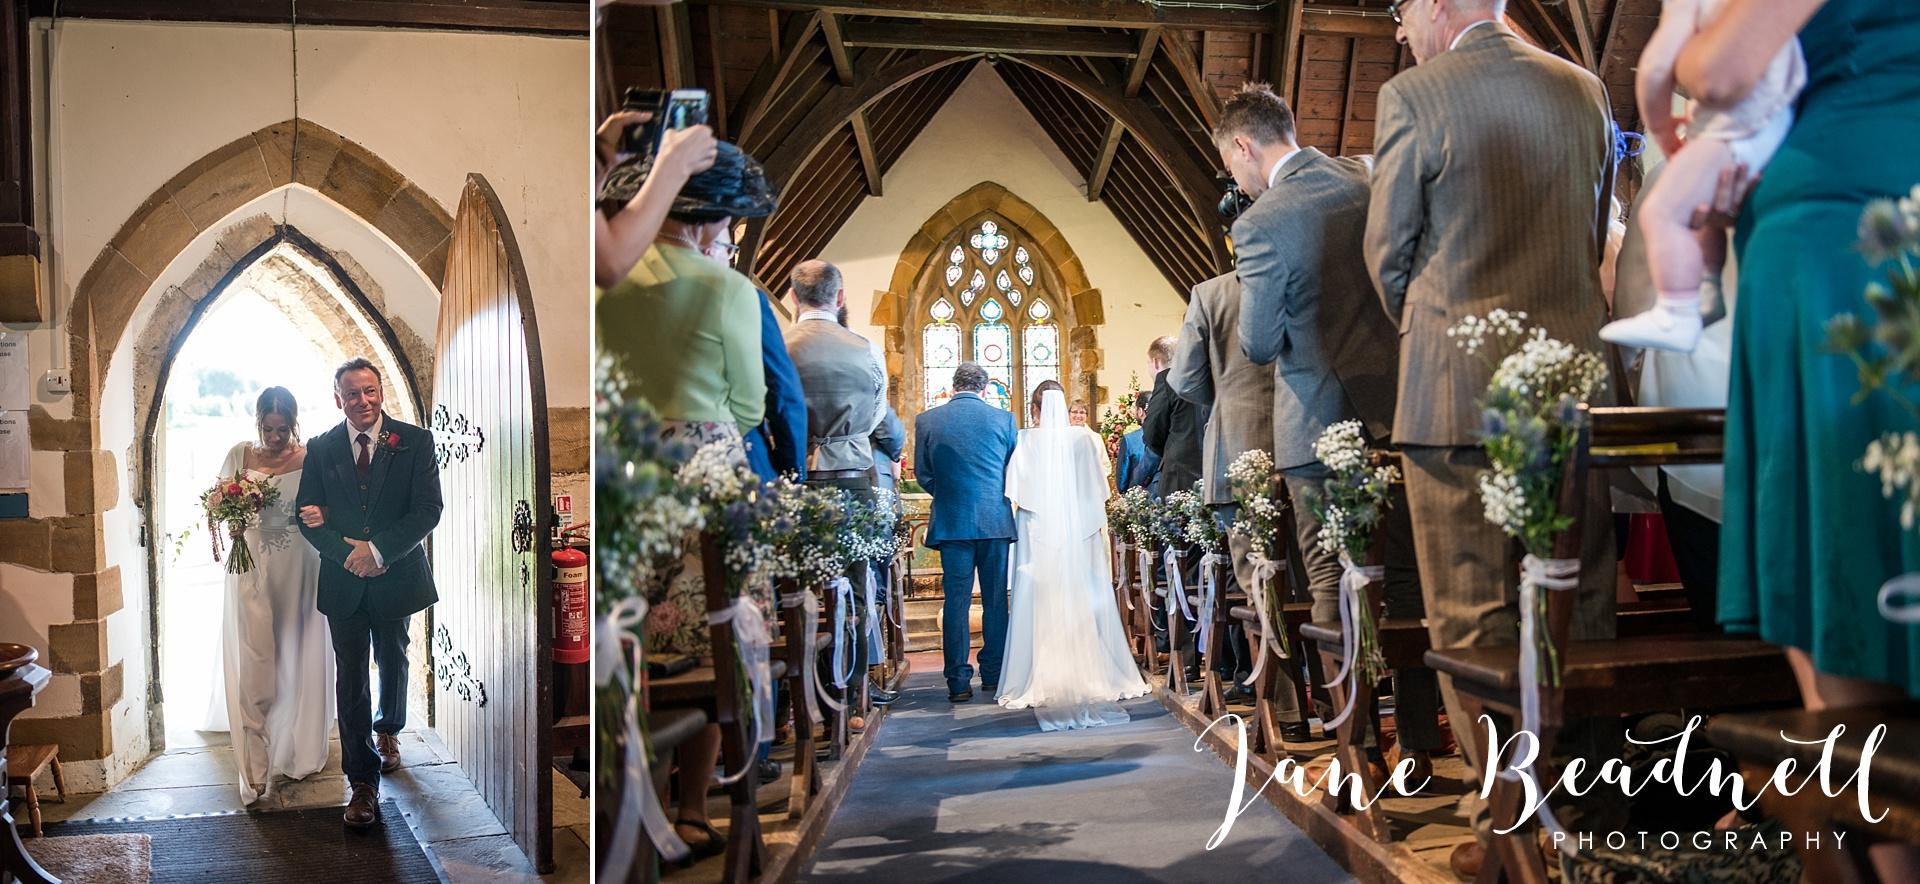 fine-art-wedding-photographer-jane-beadnell-yorkshire-wedding-photographer_0046